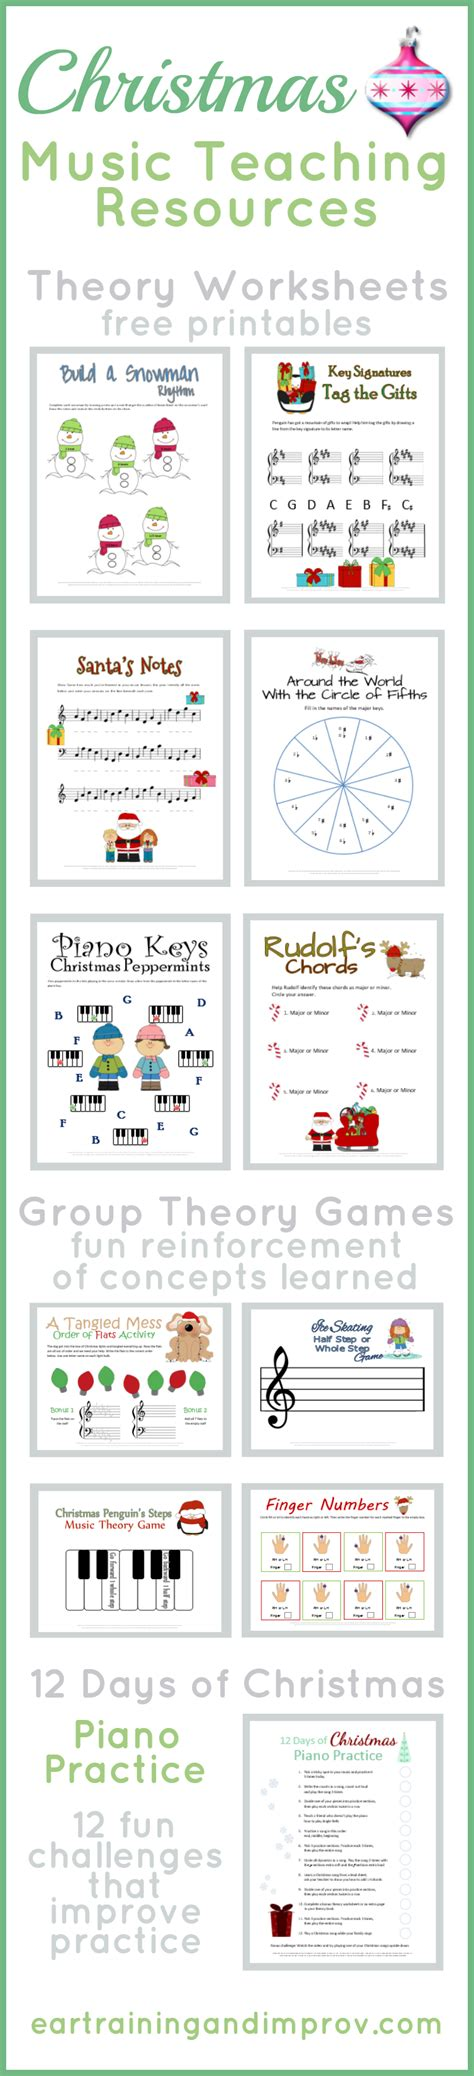 Christmas Music Theory Worksheets  20+ Free Printables